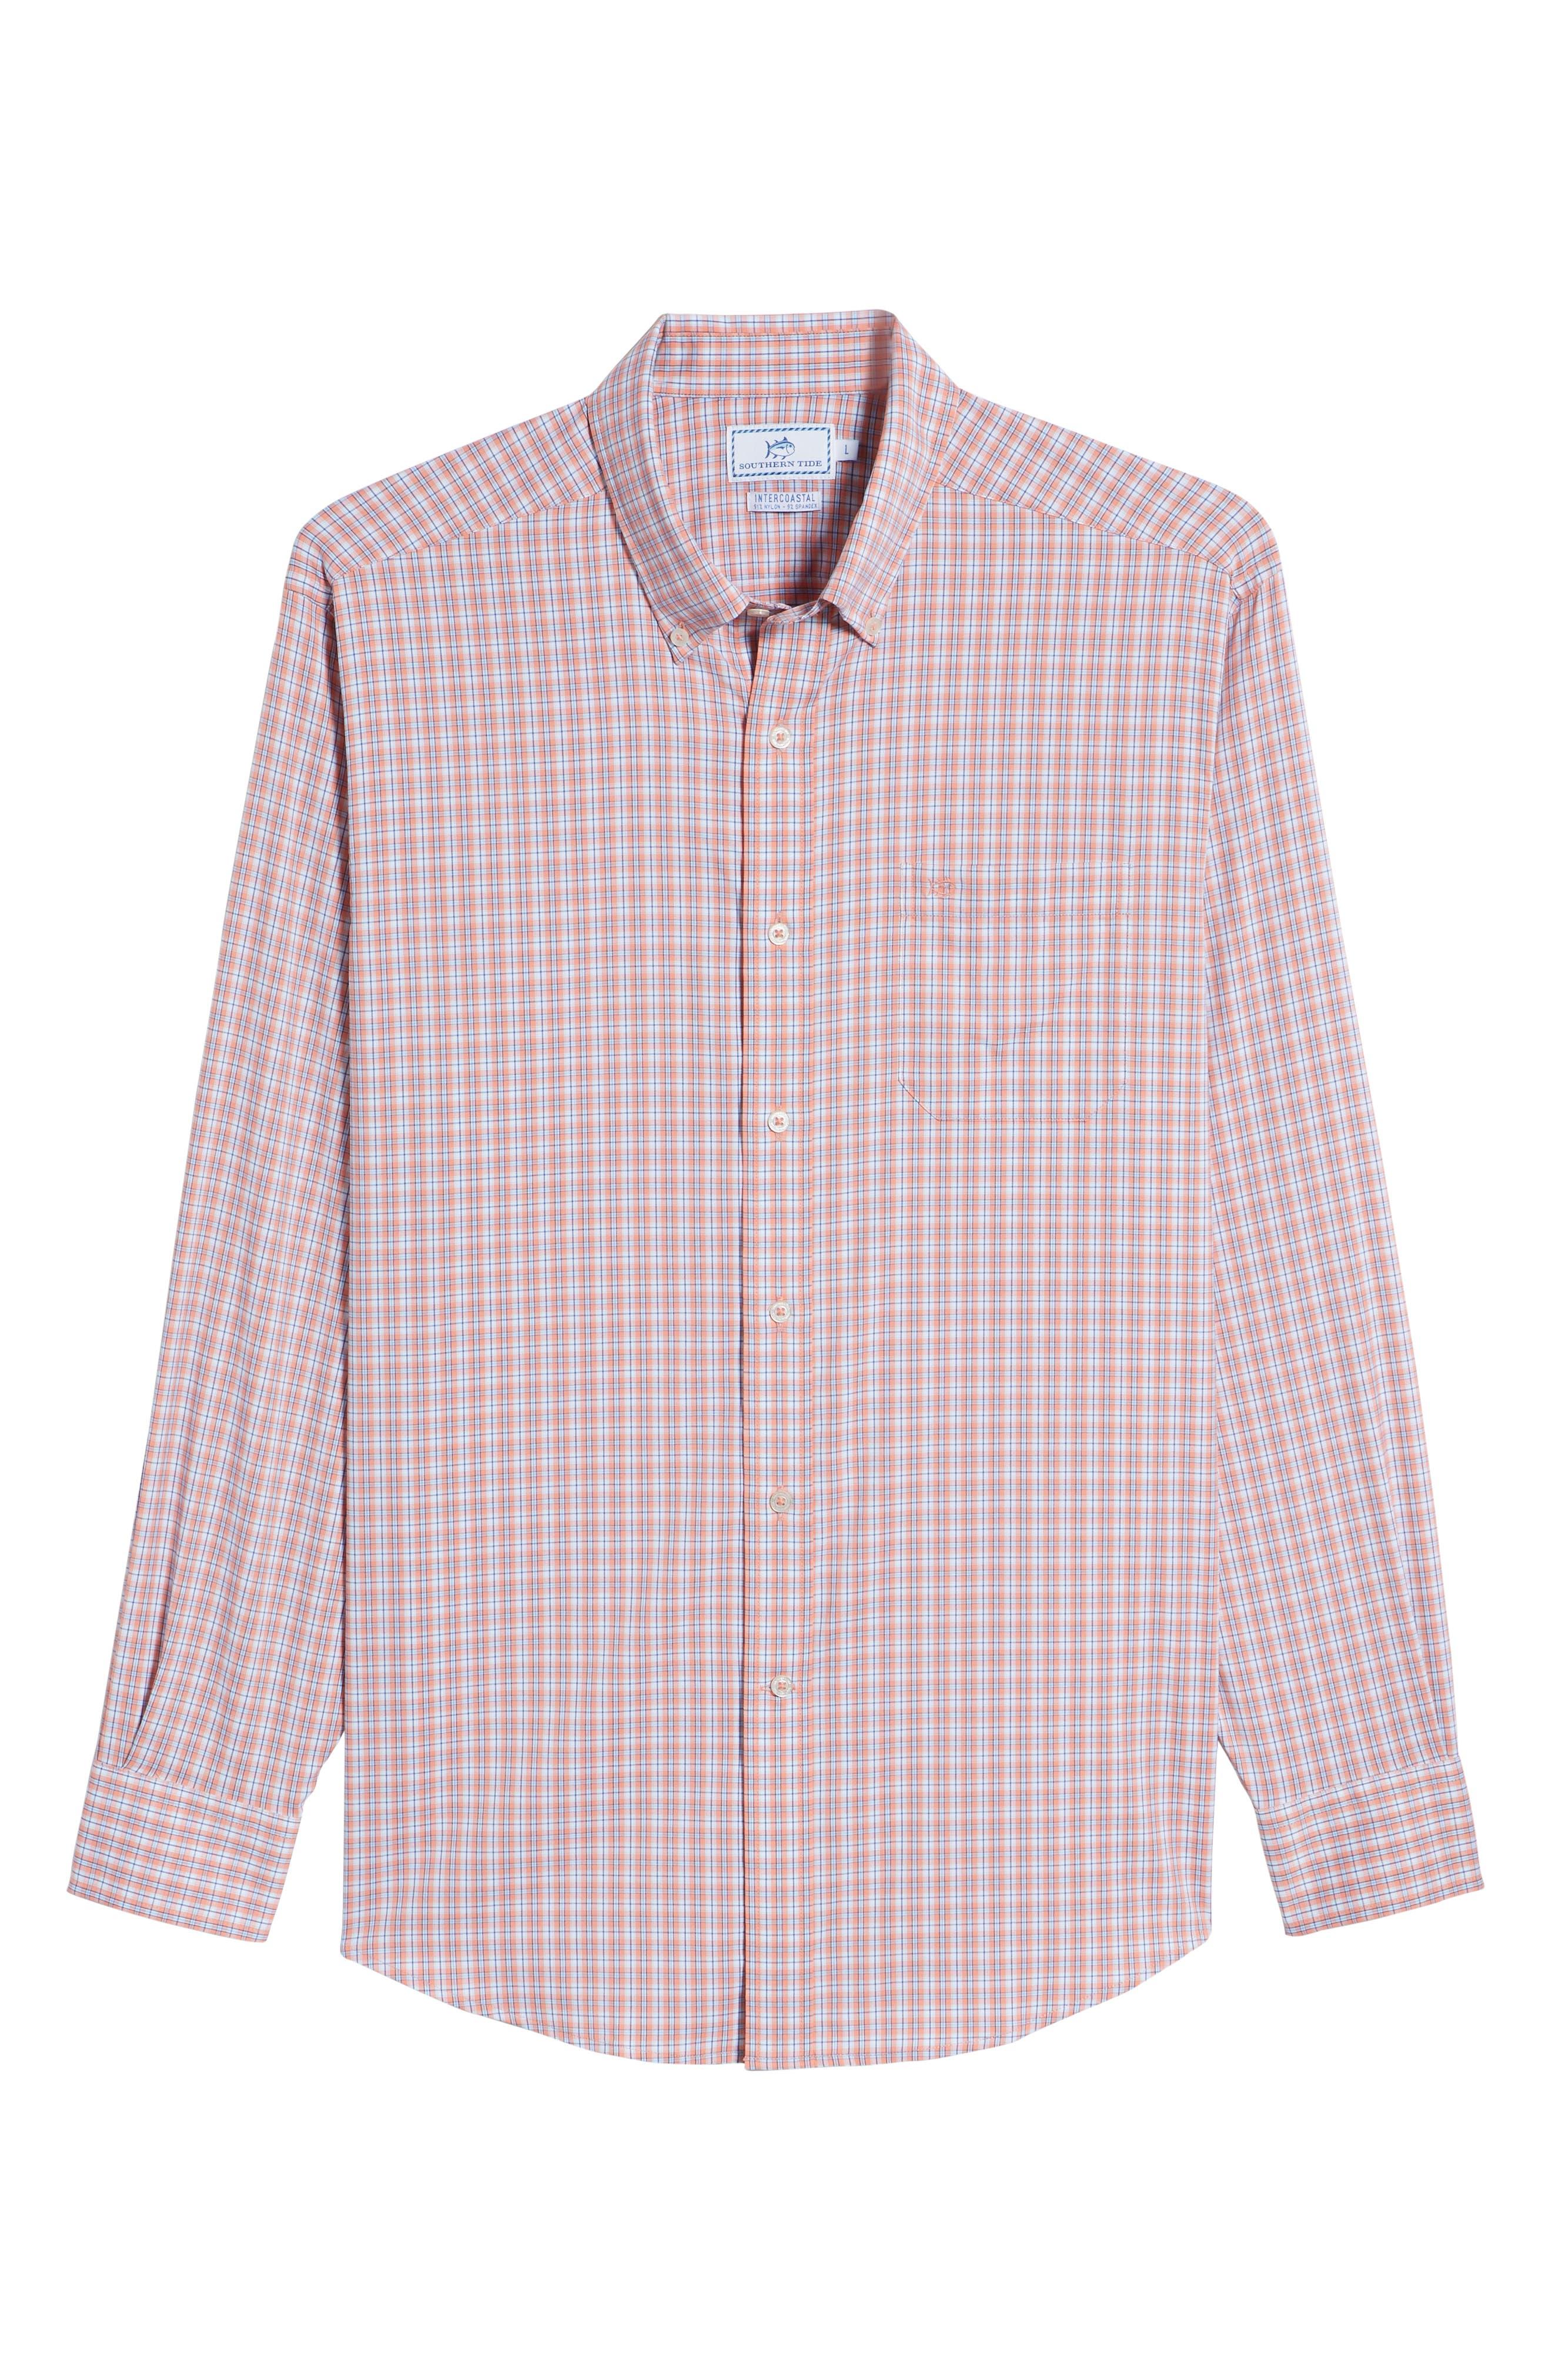 Grand Turk Regular Fit Stretch Plaid Sport Shirt,                             Alternate thumbnail 6, color,                             801